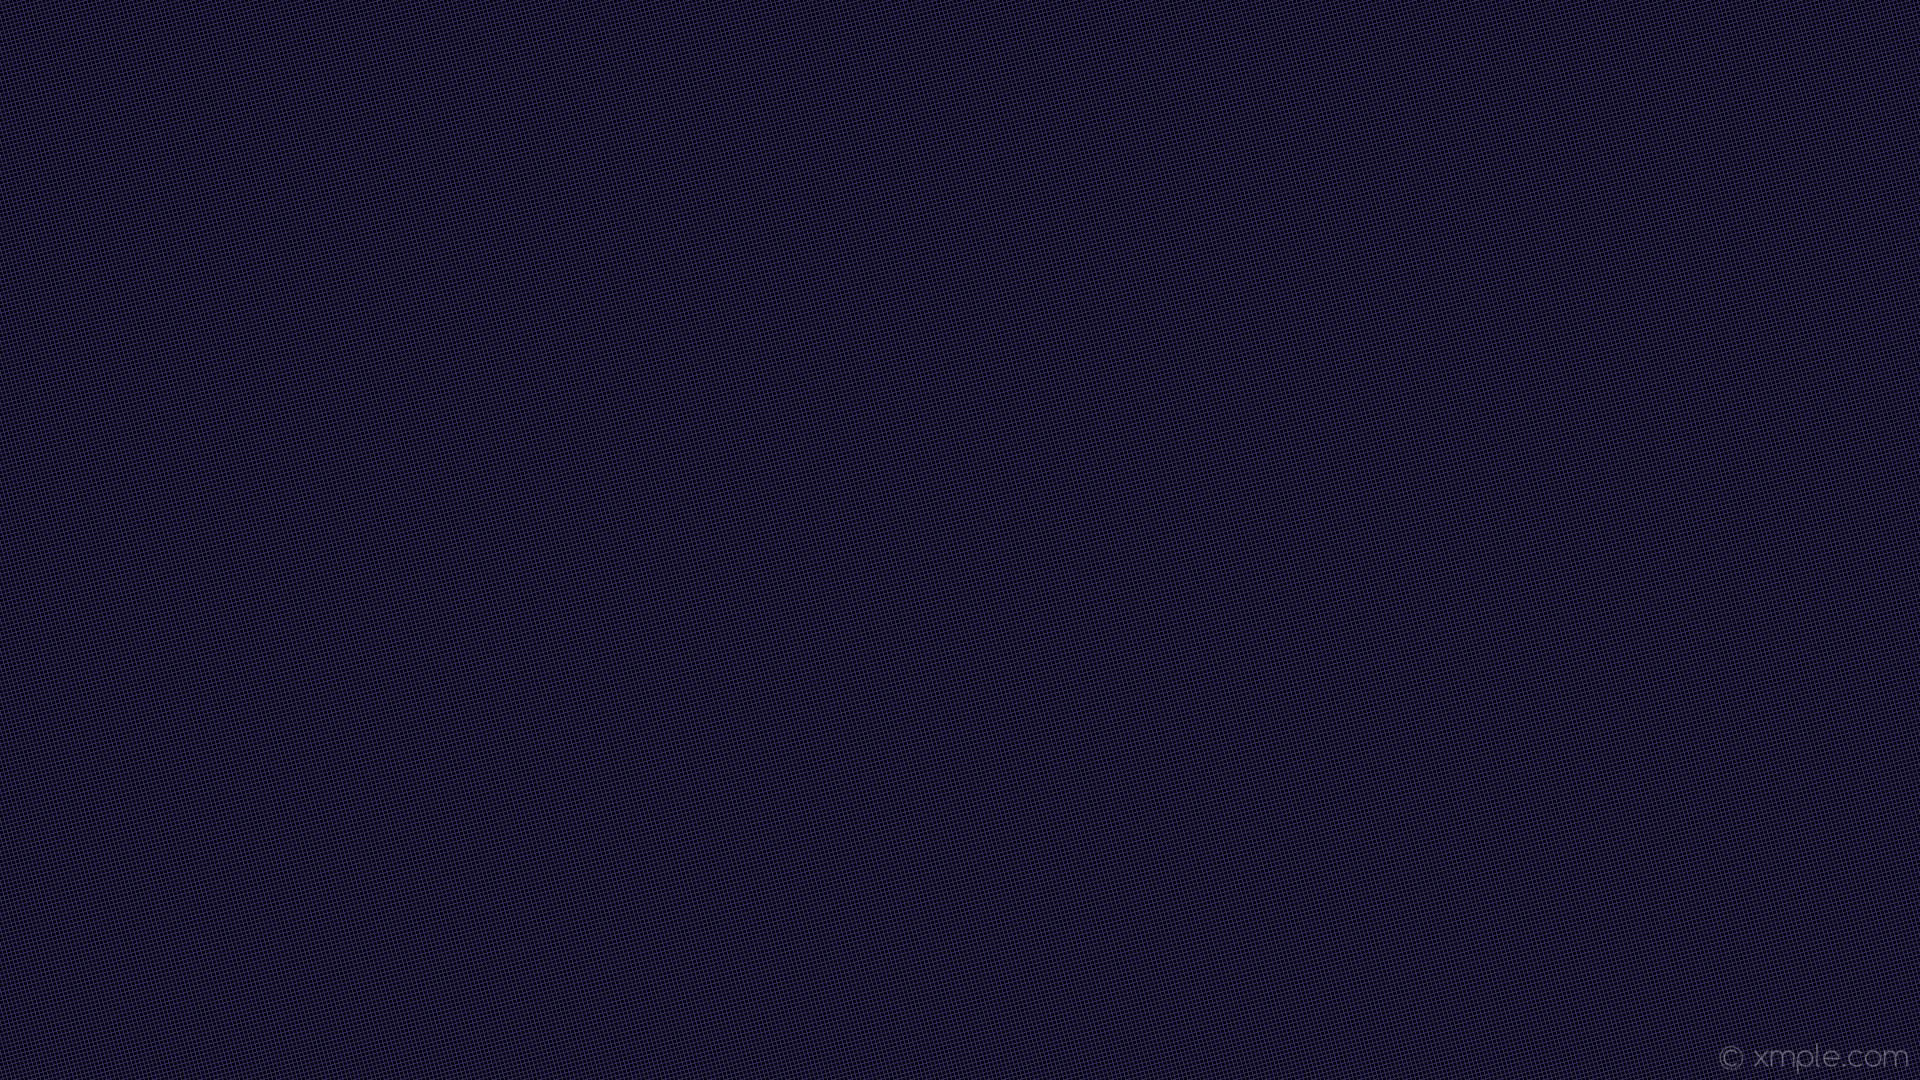 wallpaper graph paper black purple grid dark slate blue #000000 #483d8b 15°  1px